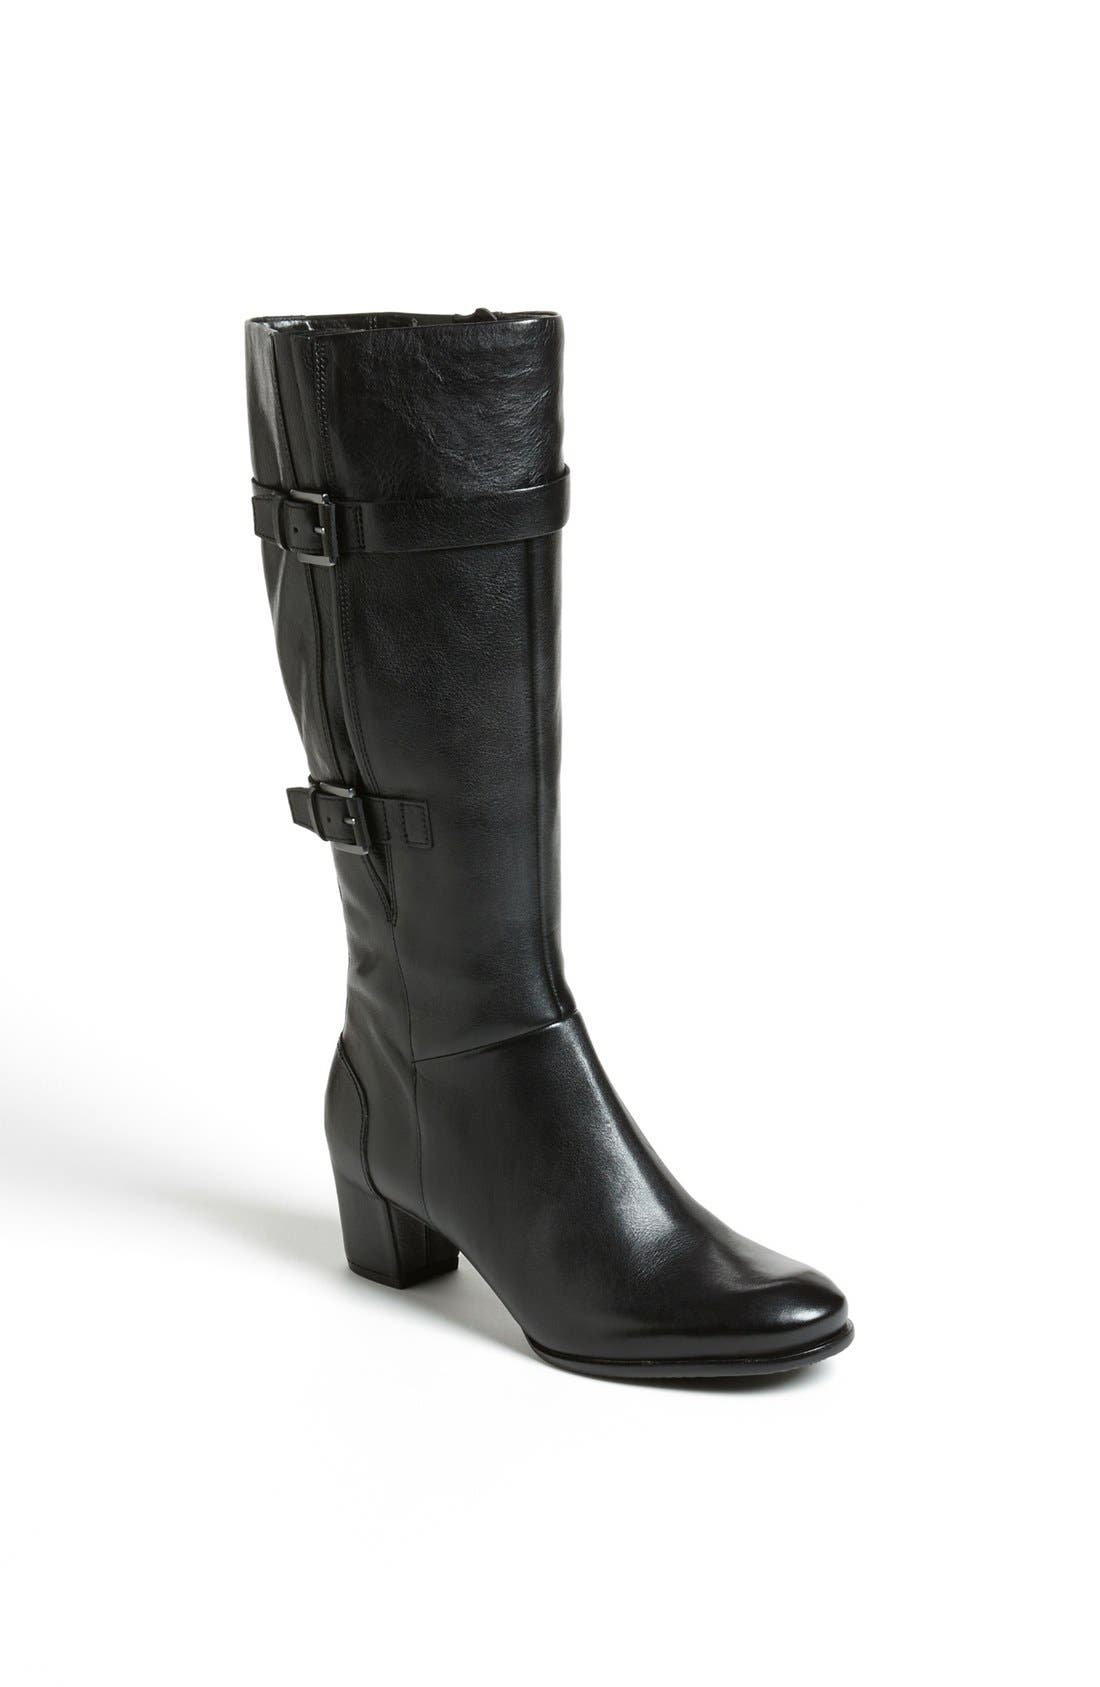 Alternate Image 1 Selected - ECCO 'Pailin' Boot (Wide Calf)